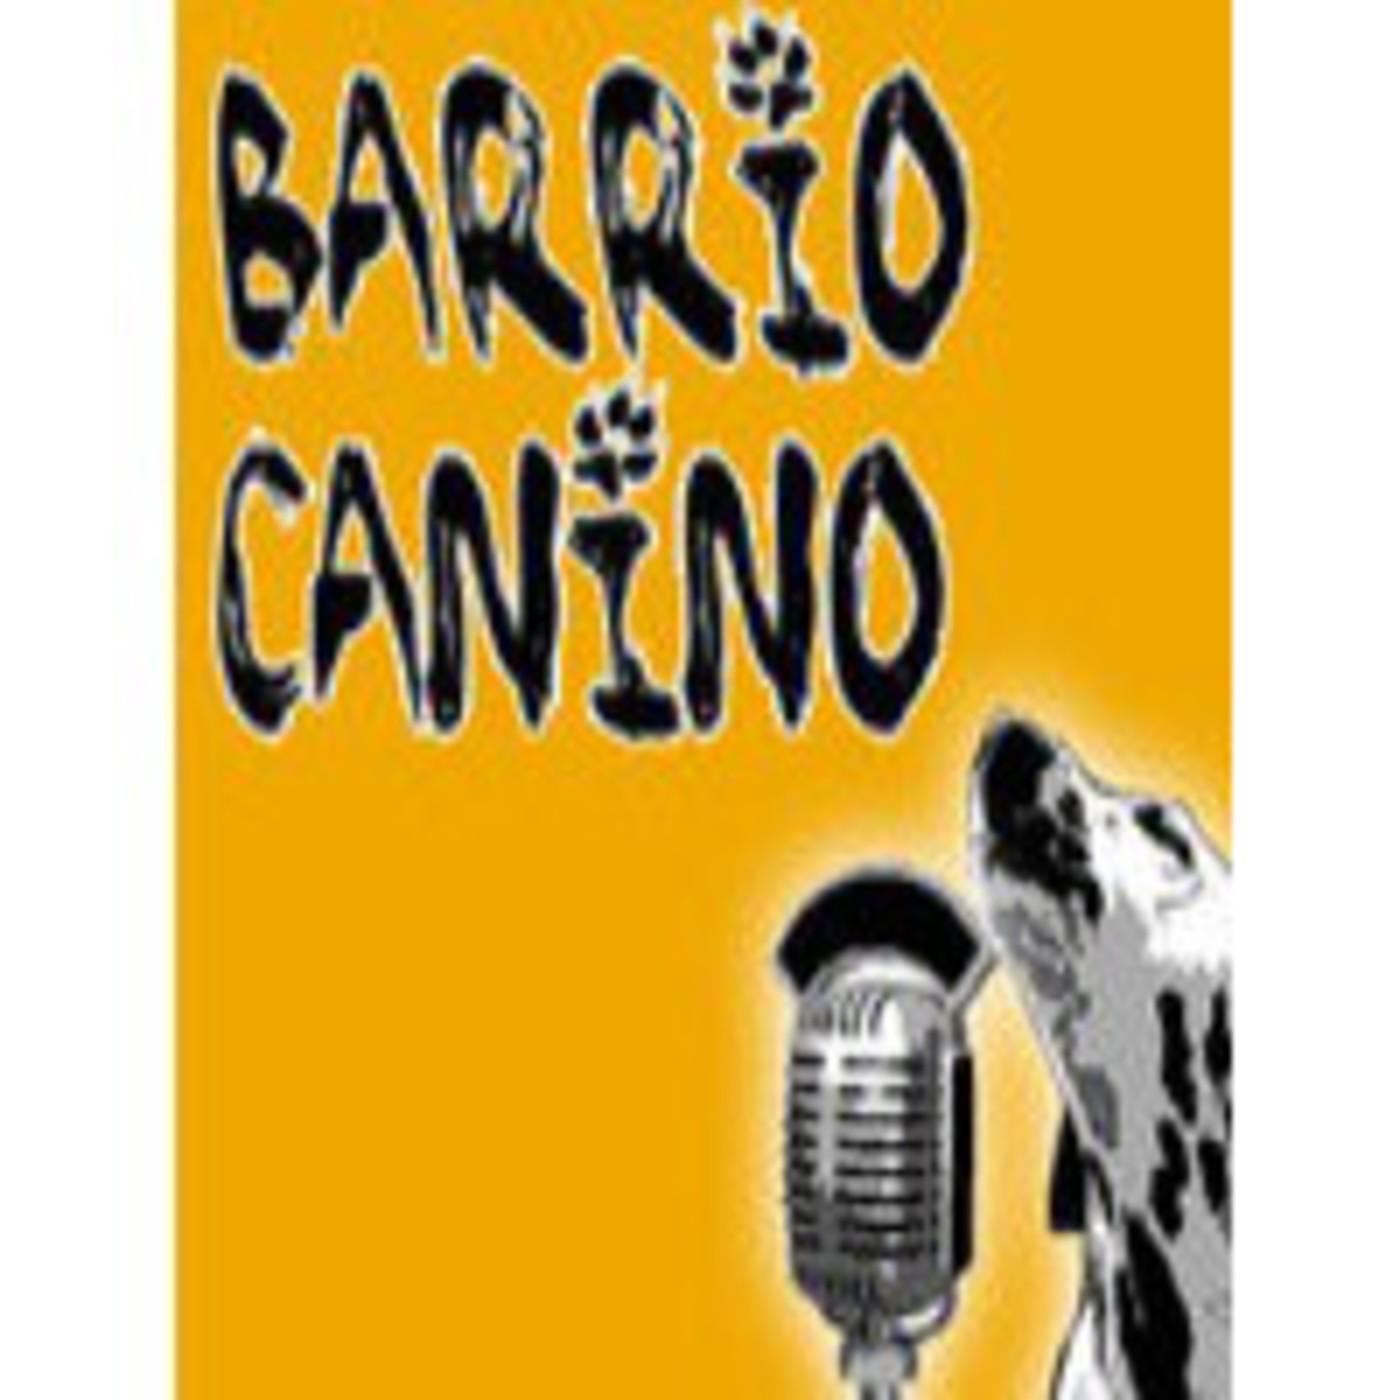 Barrio Canino vol.101 - 20131220 - César Rendueles